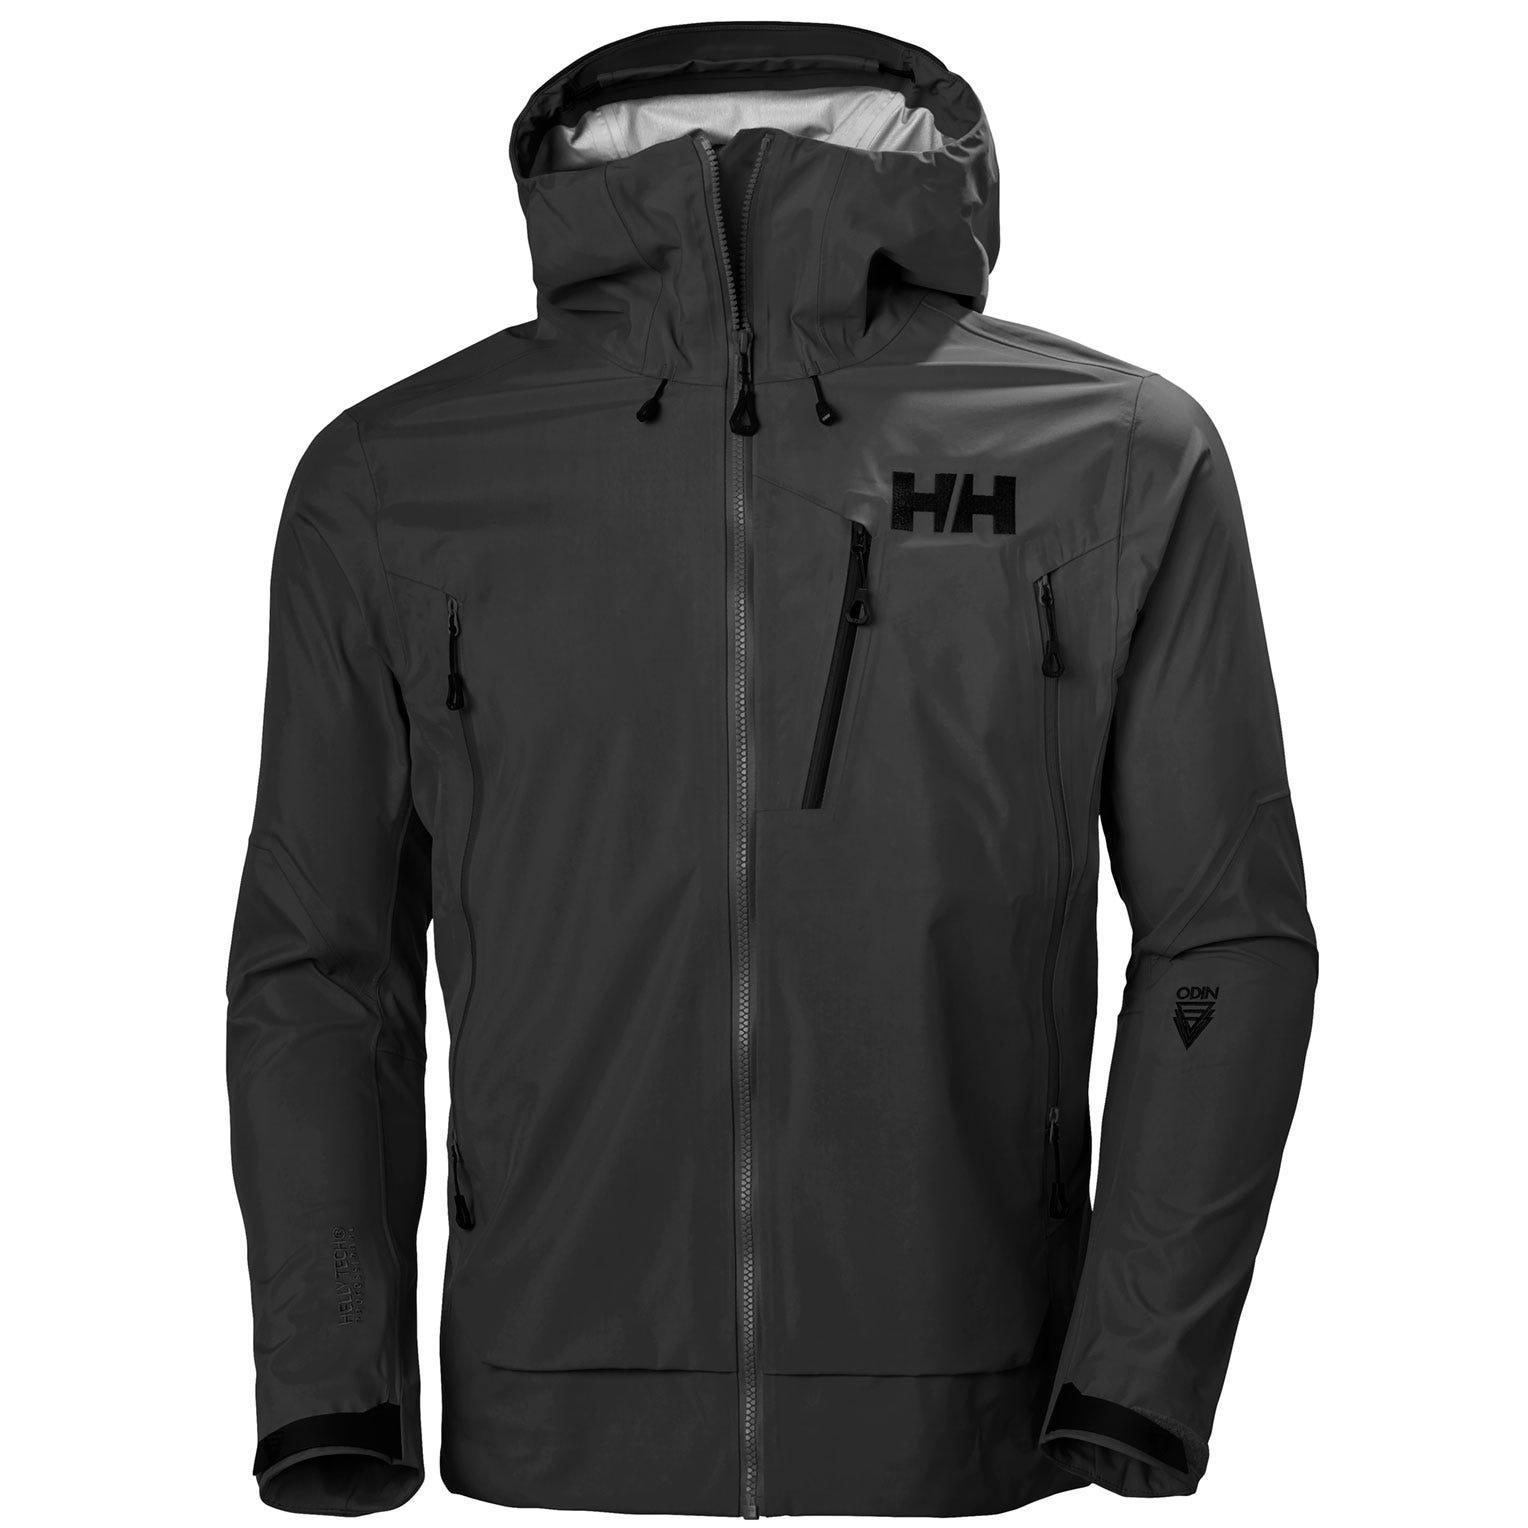 Helly Hansen Mens Odin 9 Worlds 2.0 Shell Jacket - Mountain Black XXL